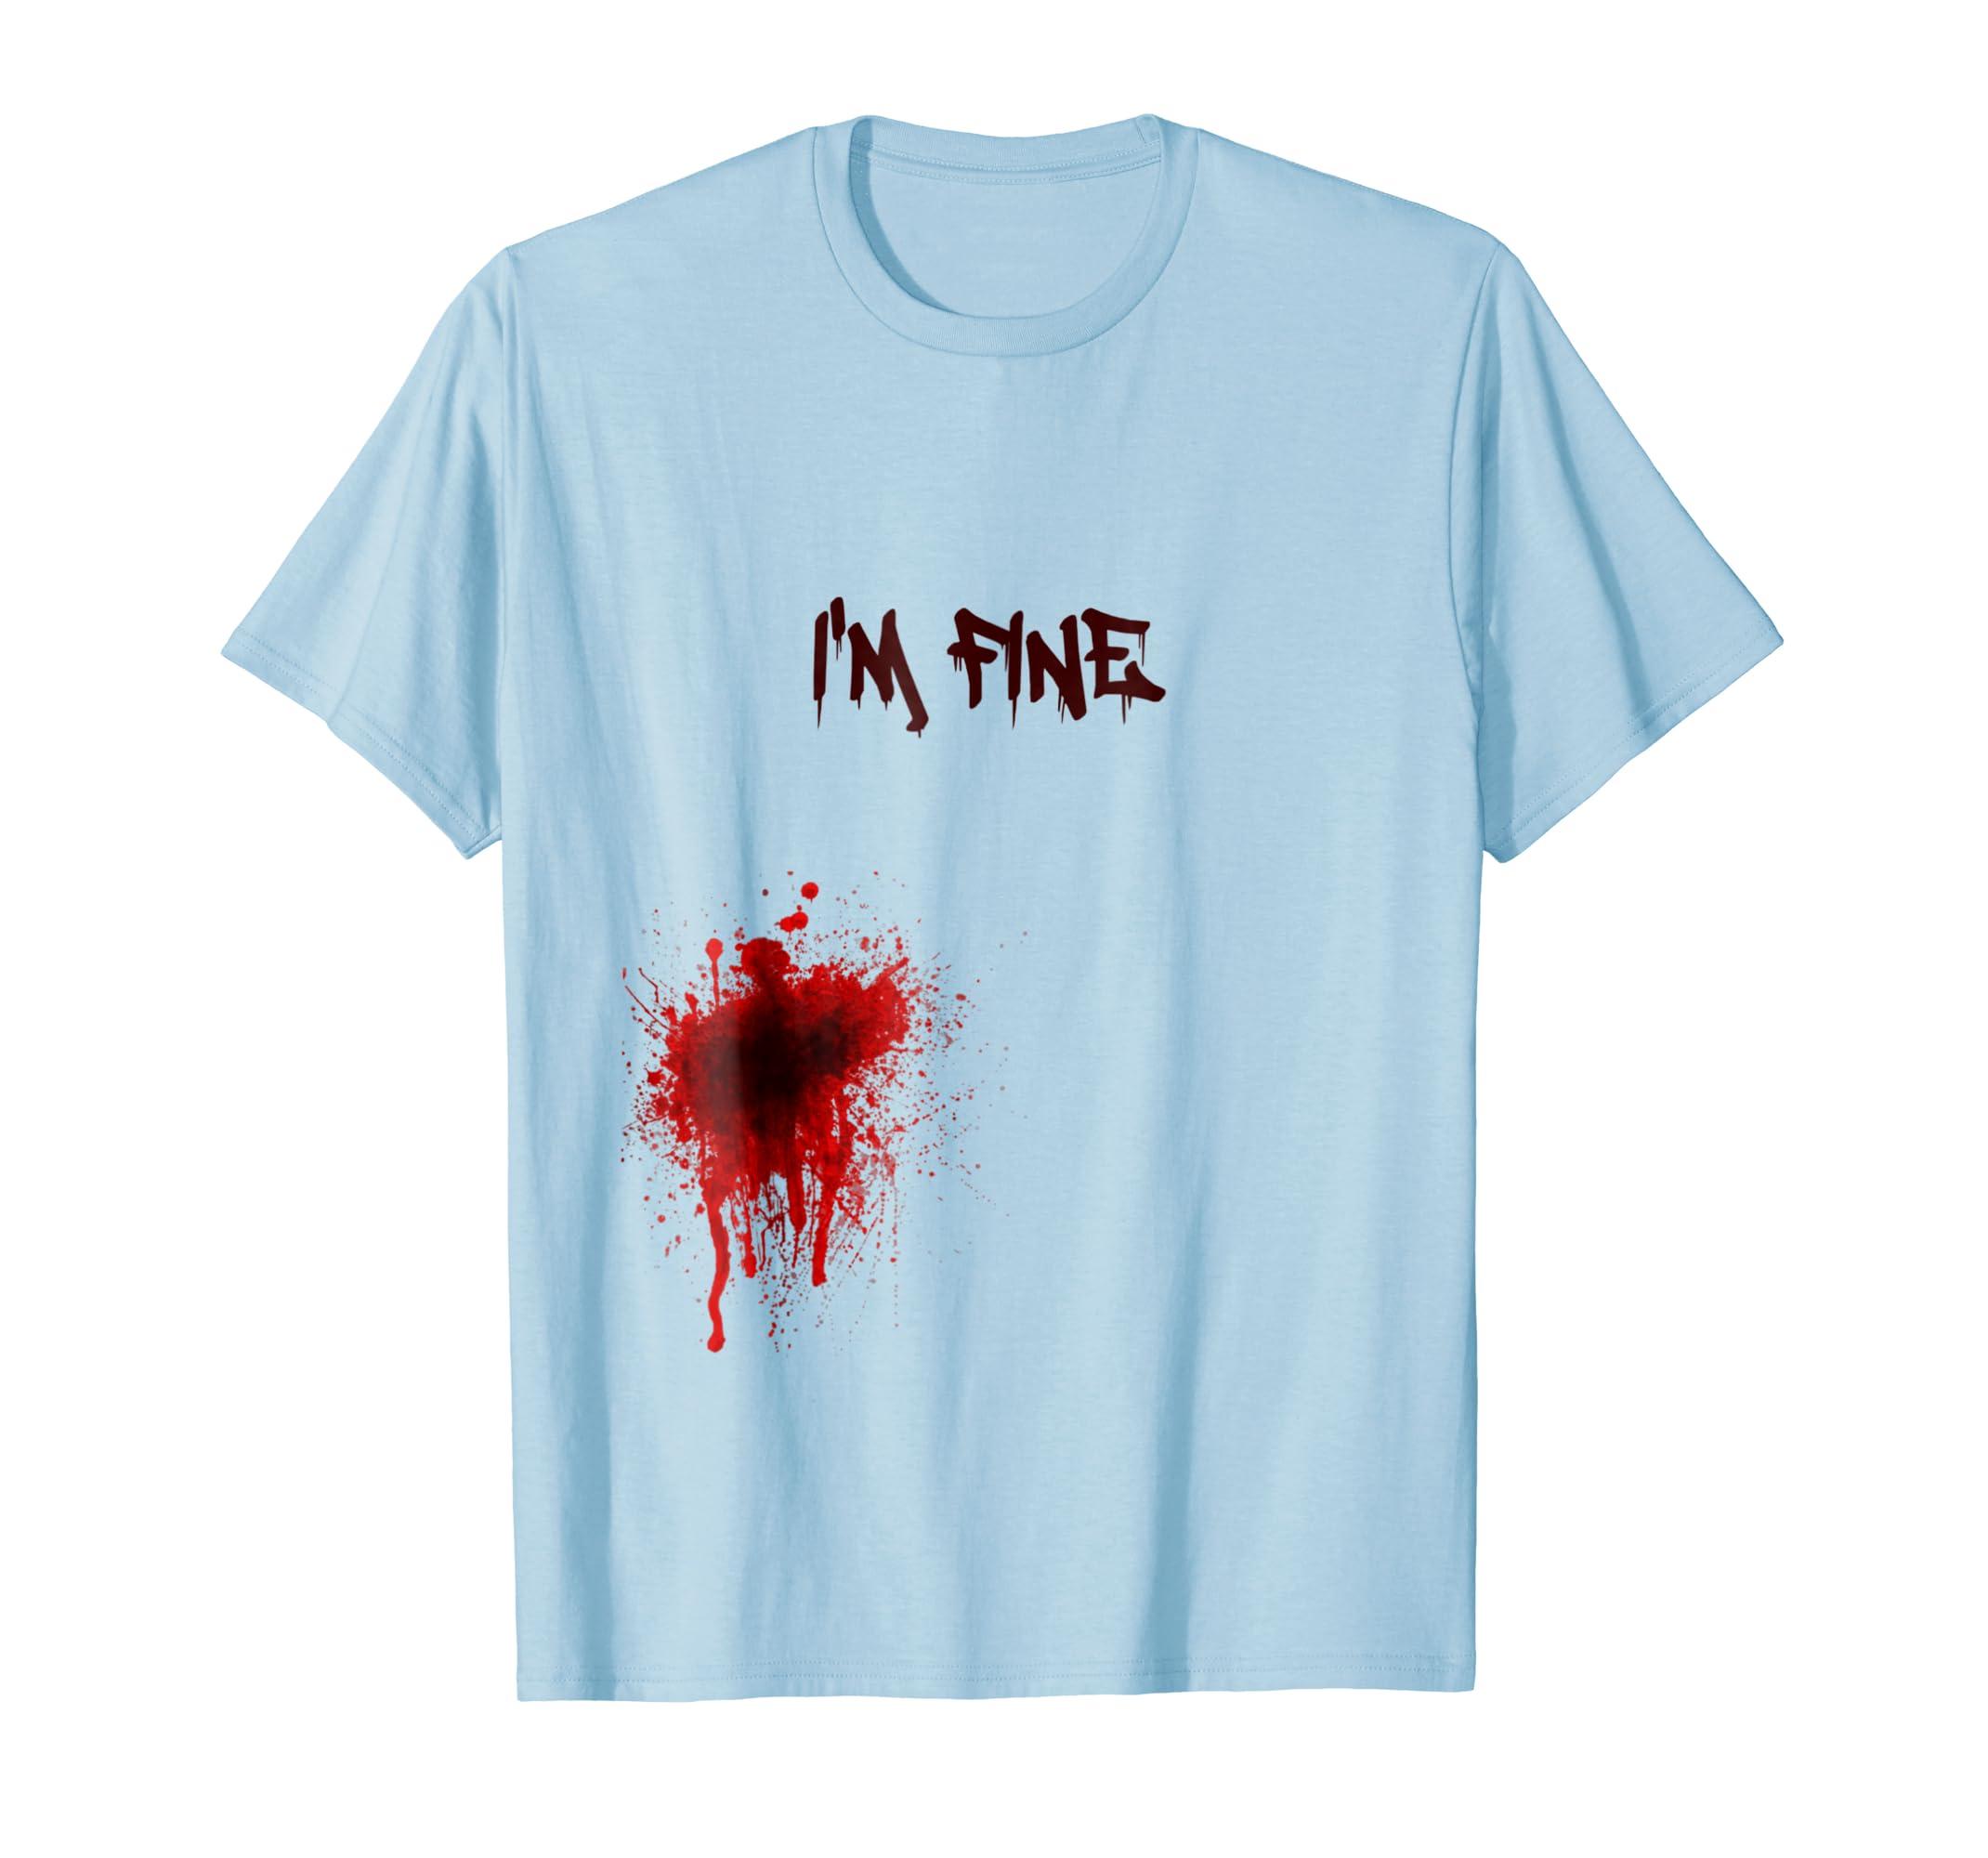 2018 I'm Fine Graphic Zombie Bite Bloody Halloween T Shirt